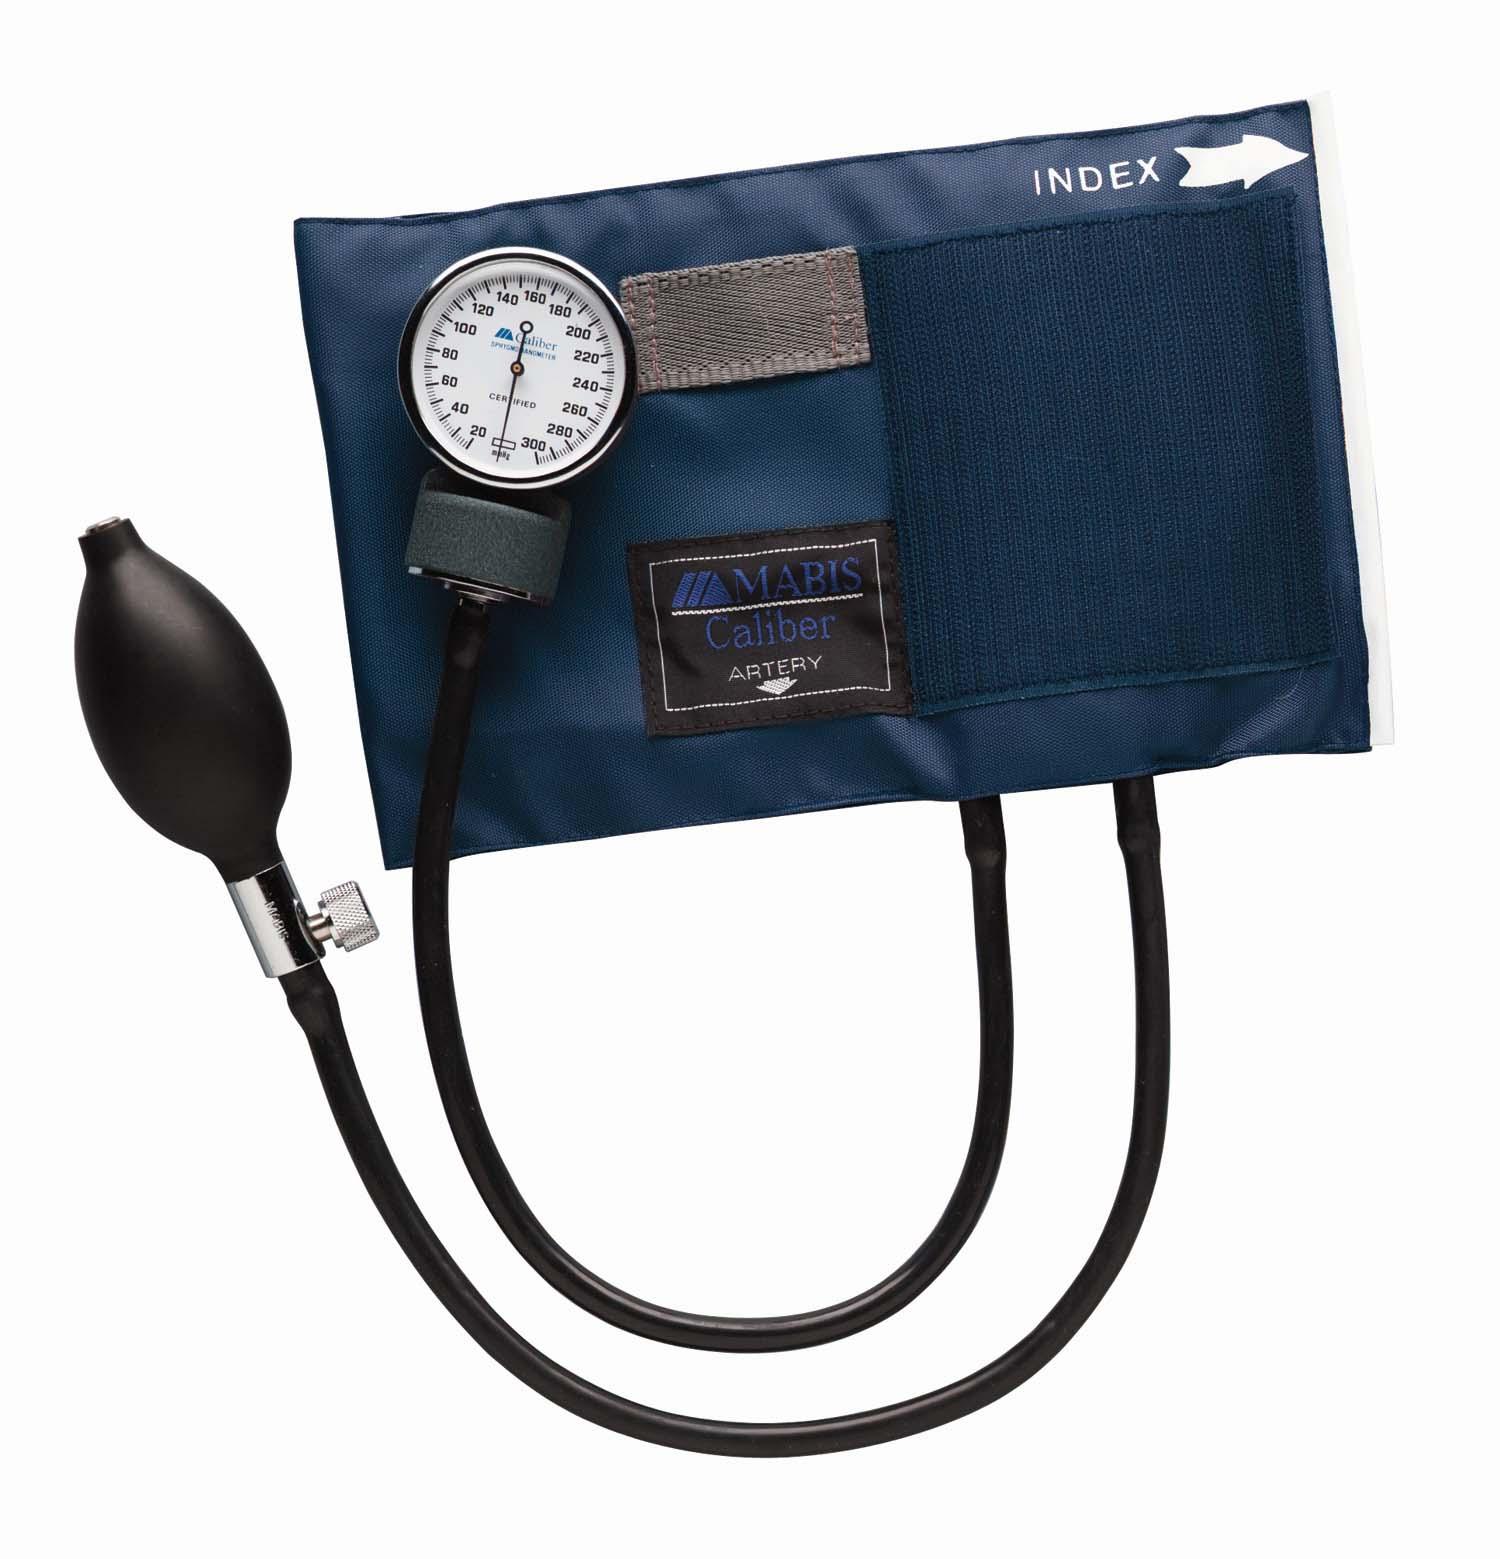 caliber-aneroid-sphygmomanometer-blue-nylon-cuff-child-01-130-015-lr.jpg